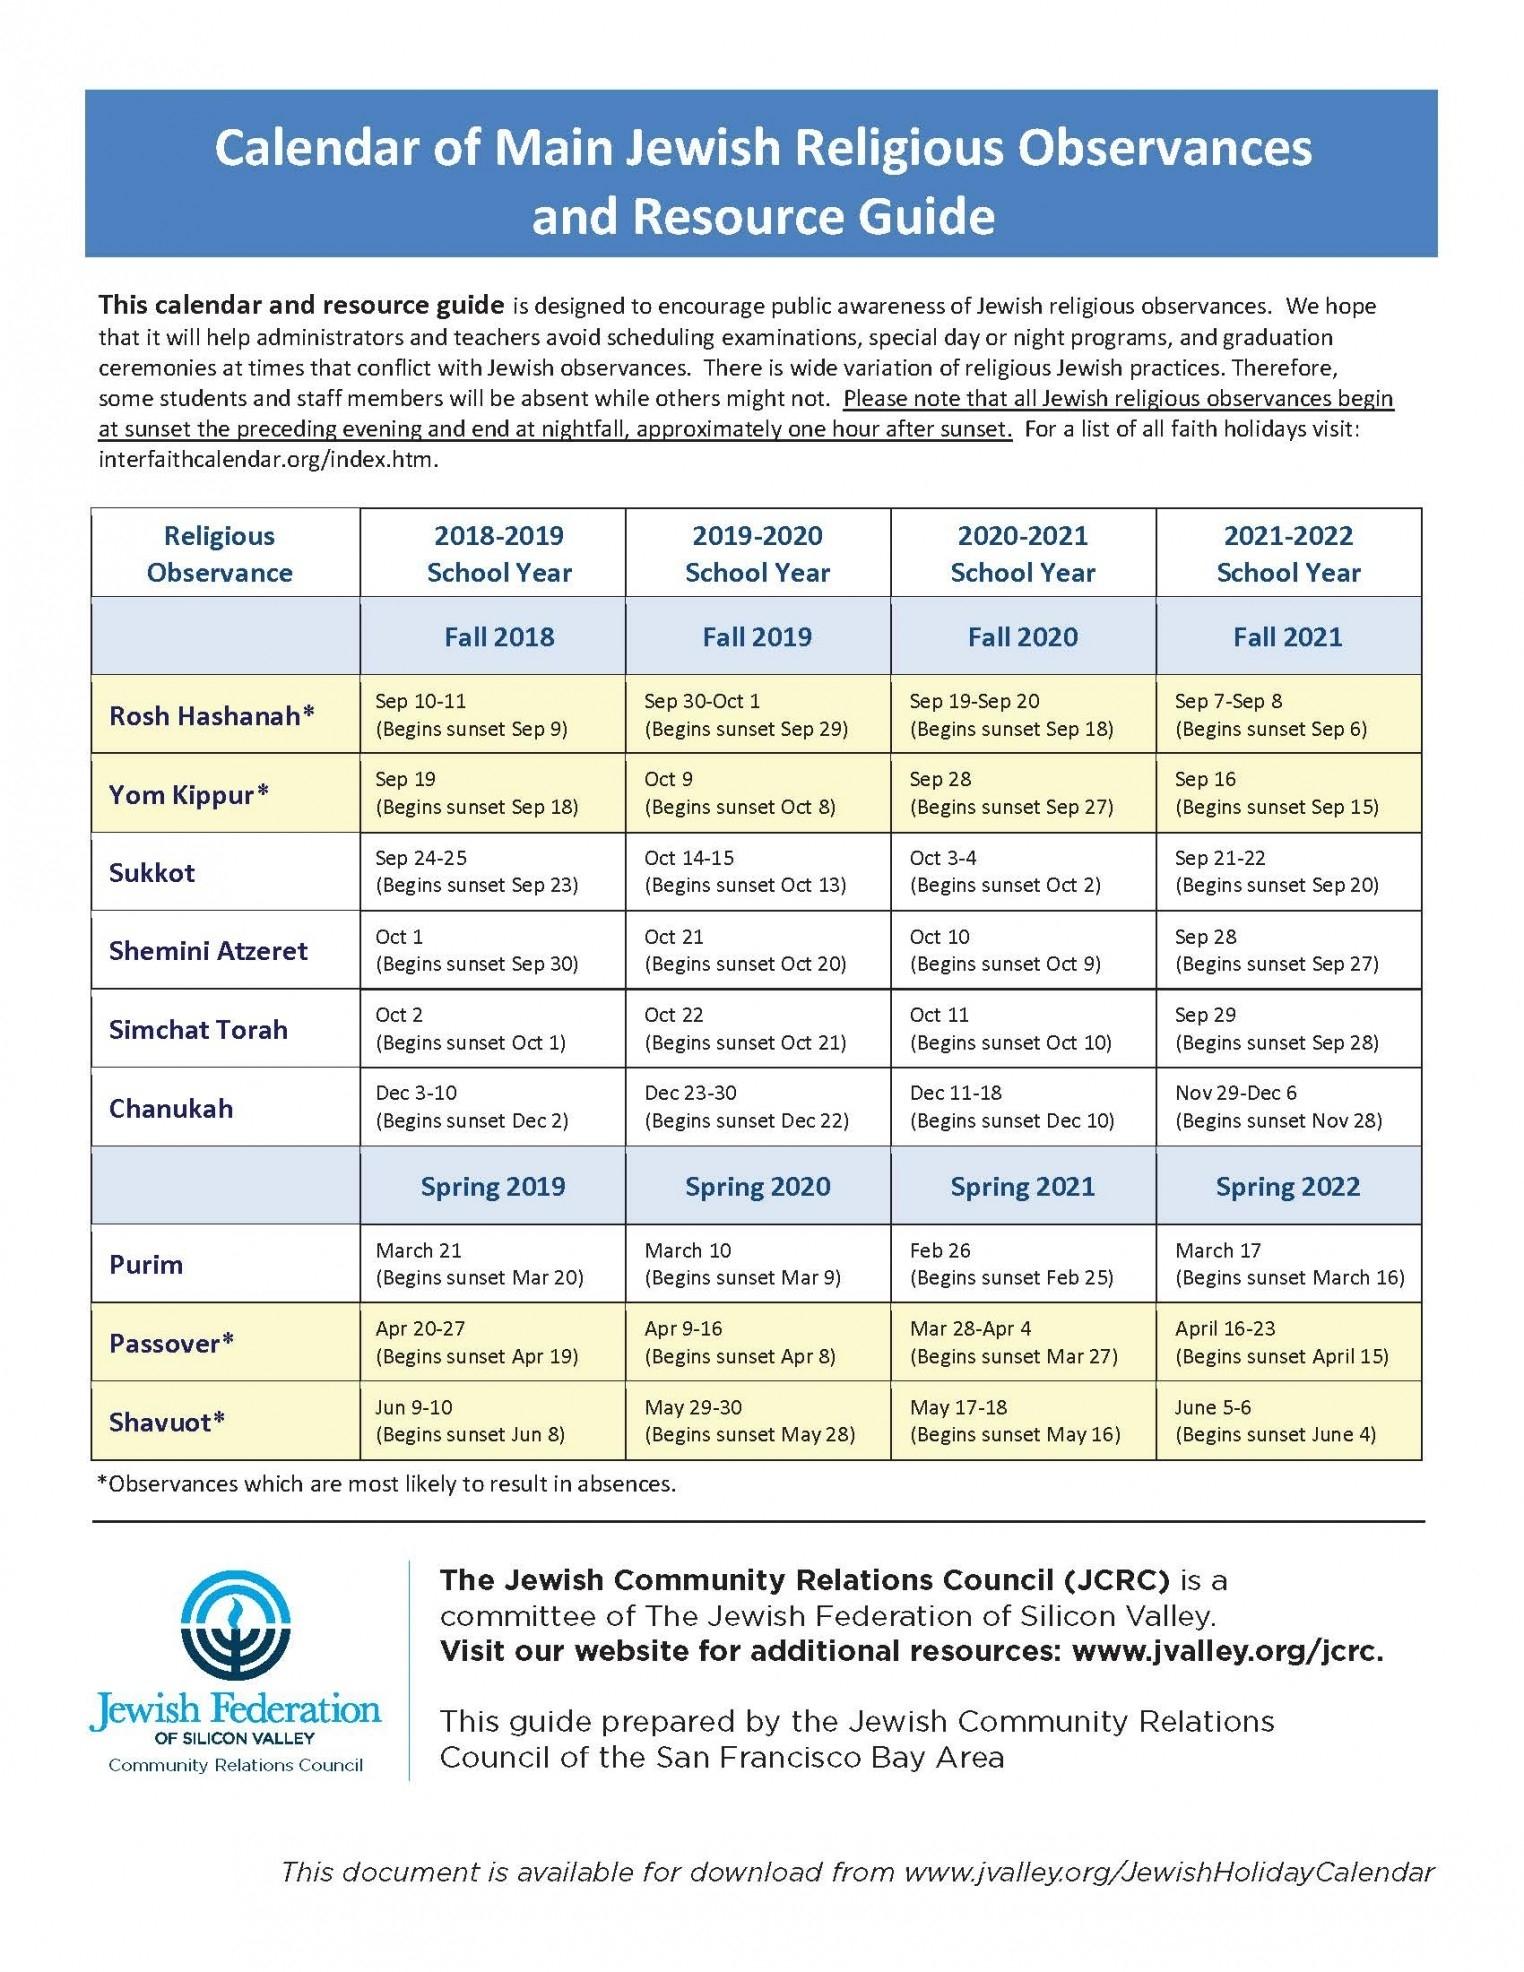 Jewish Holiday Calendar 2018-2022 | Jewish Federation Of